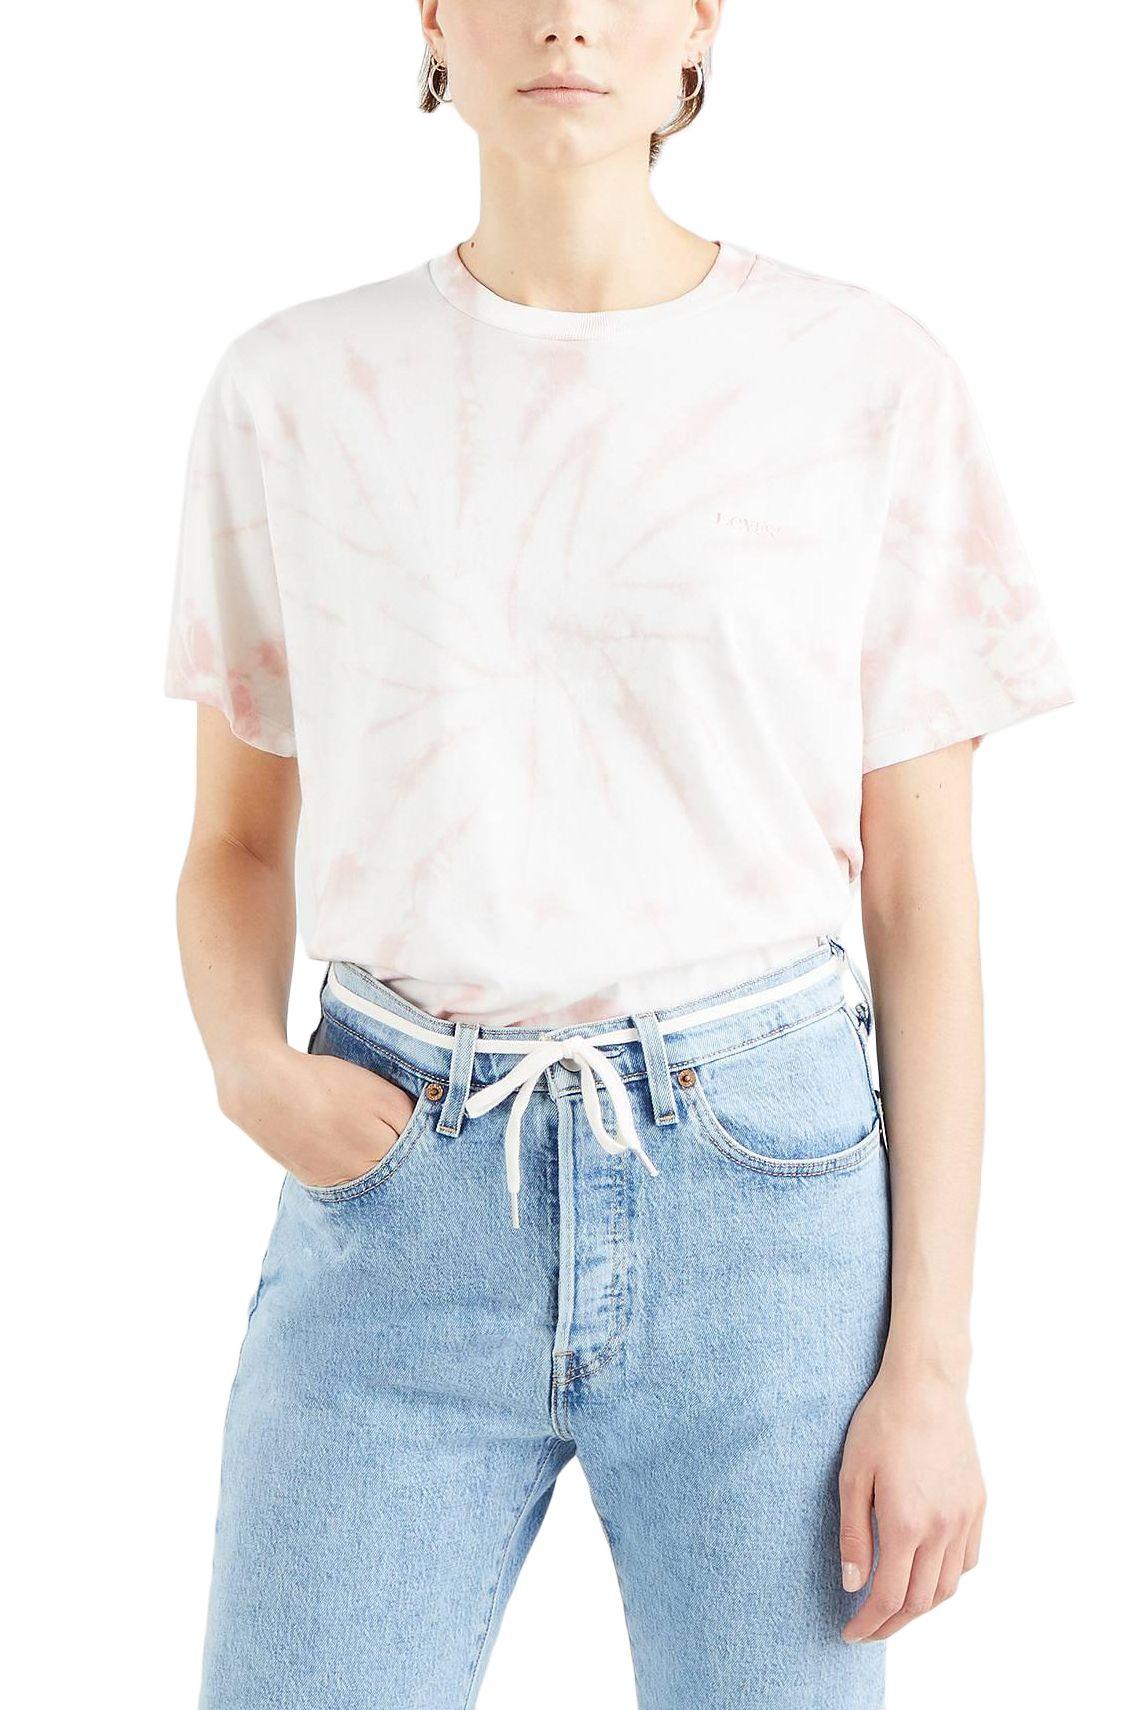 T-Shirt Levis GRAPHIC JET TEE Iris Tie Dye Dark Fa166136 Evening Sand